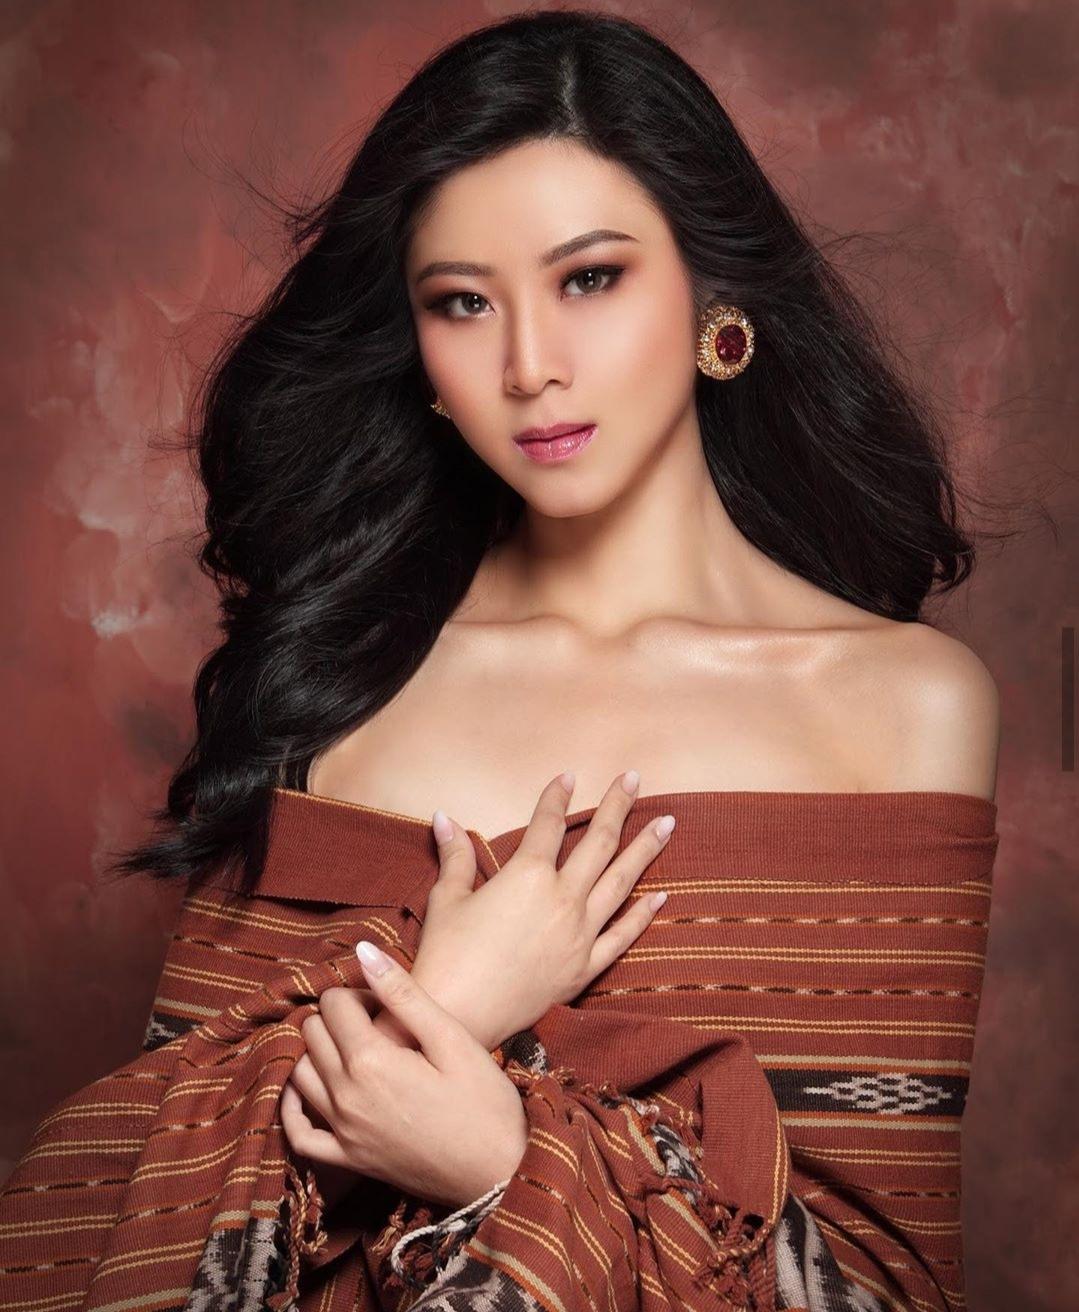 Kartu-Tarot-Peluang-Ayu-Saraswati-Miss-International-Indonesia-2020-di-Ajang-Miss-International-2020